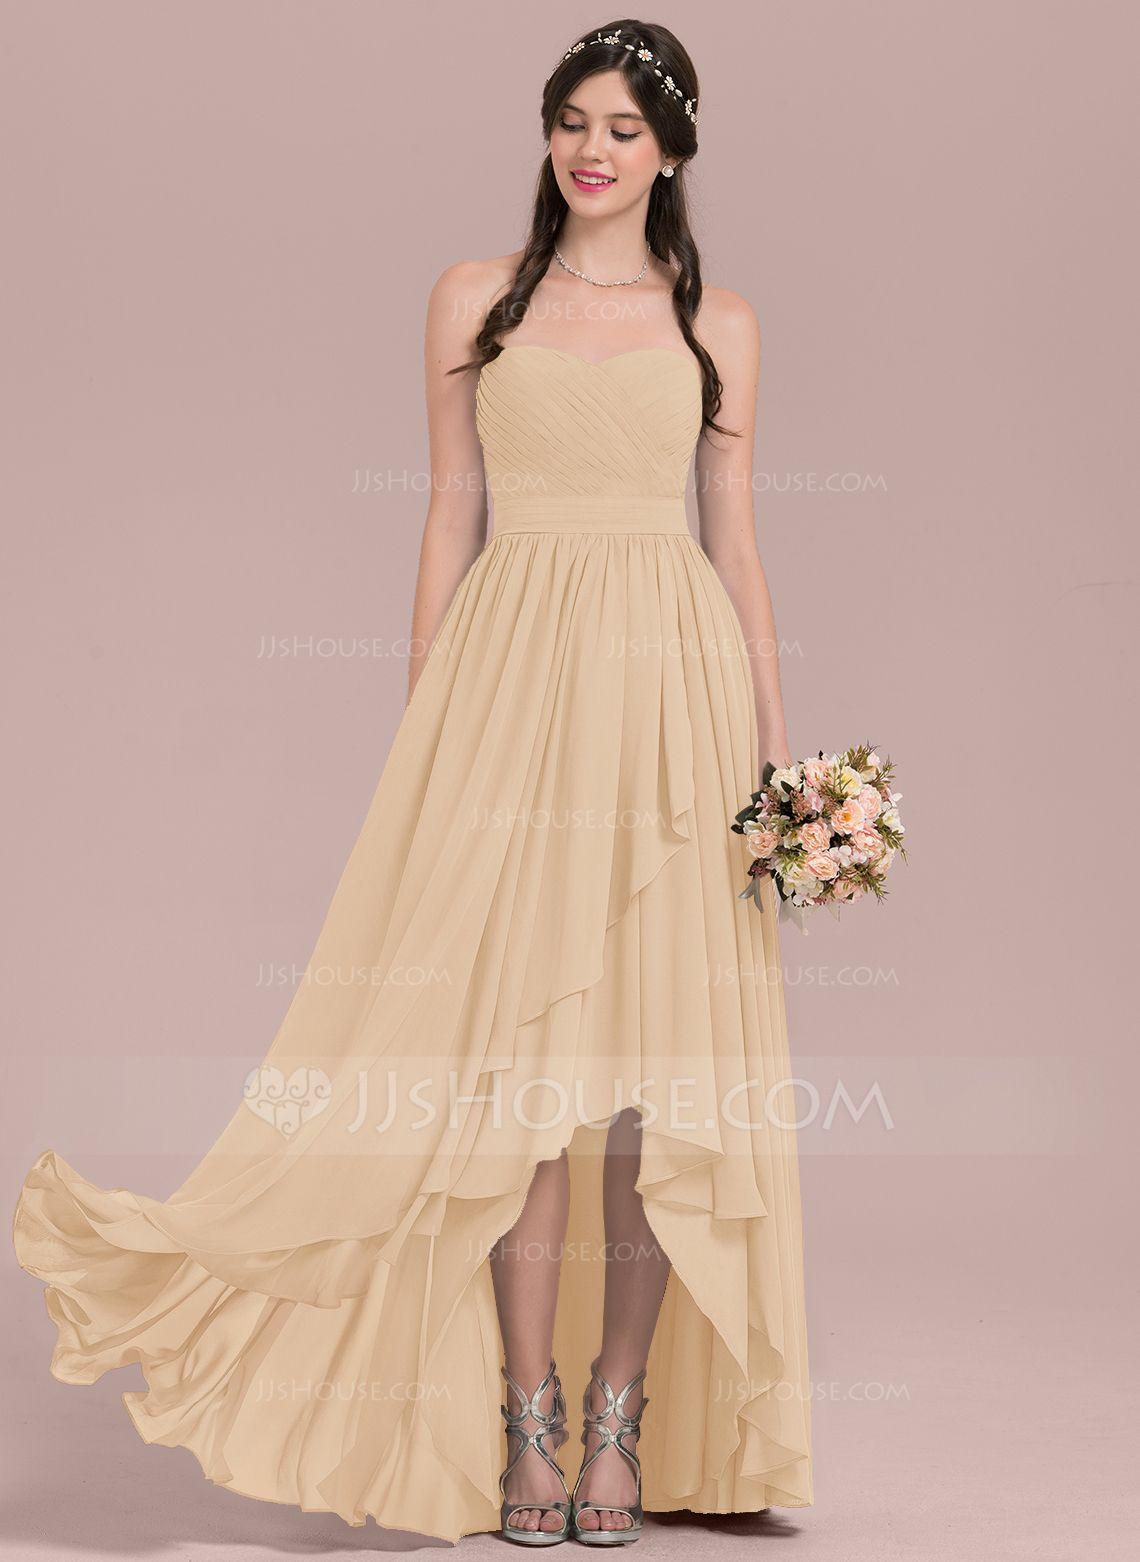 e6d9fc9caa73 A-Line/Princess Sweetheart Asymmetrical Chiffon Bridesmaid Dress With  Cascading Ruffles (007126464) - Bridesmaid Dresses - JJ's House